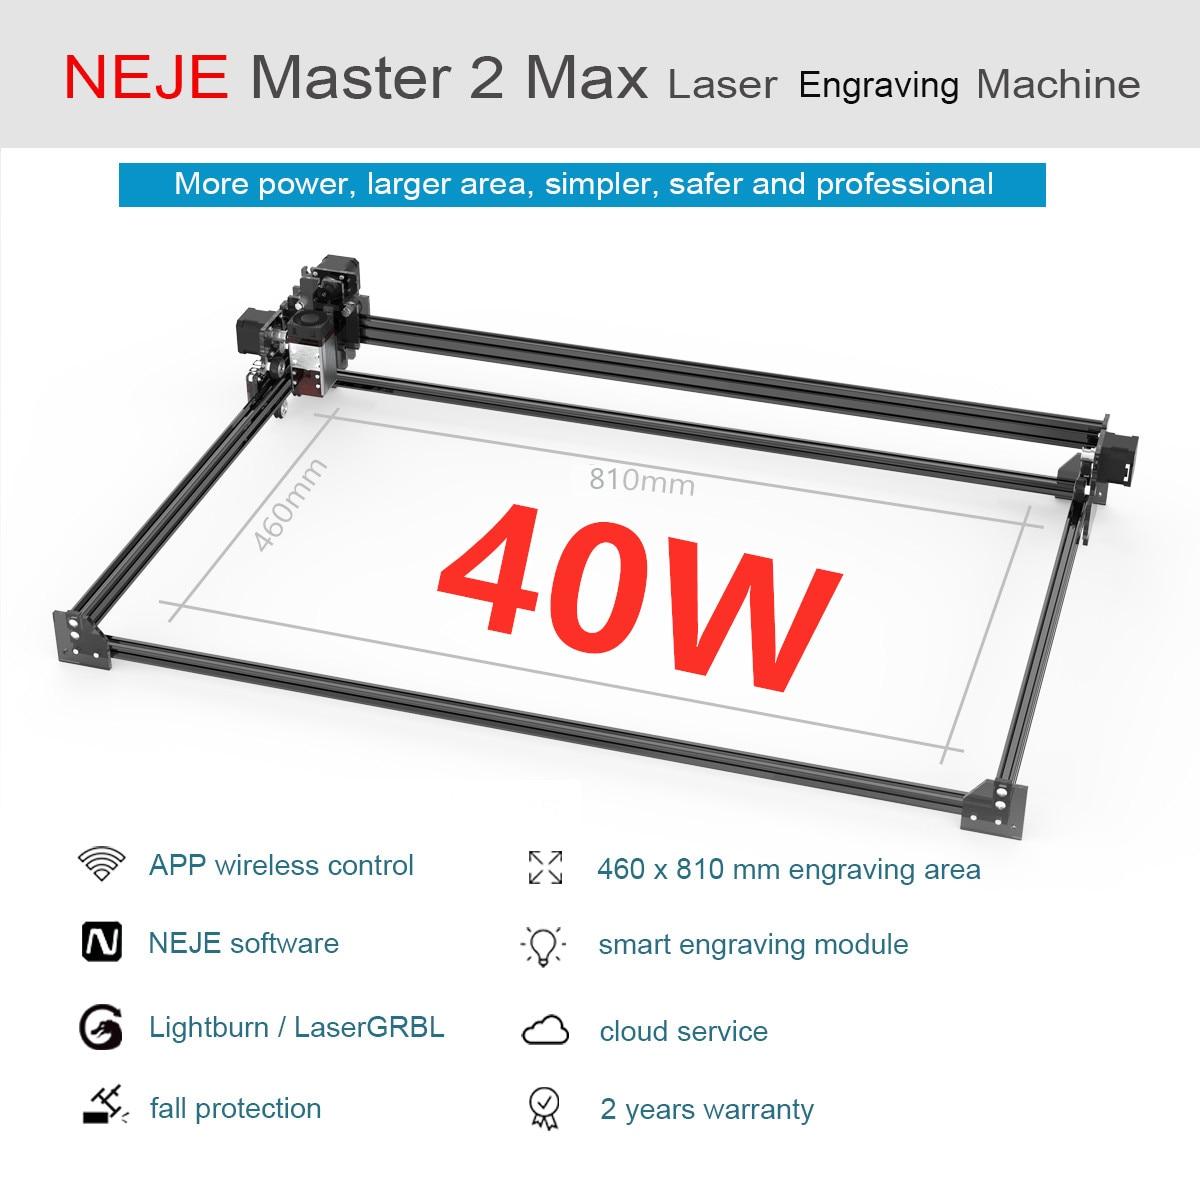 2020 NEJE Master 2 Max 40W 460 x 810mm Professional Laser Engraving Machine, Laser Cutter - Lightburn - Bluetooth - App Control